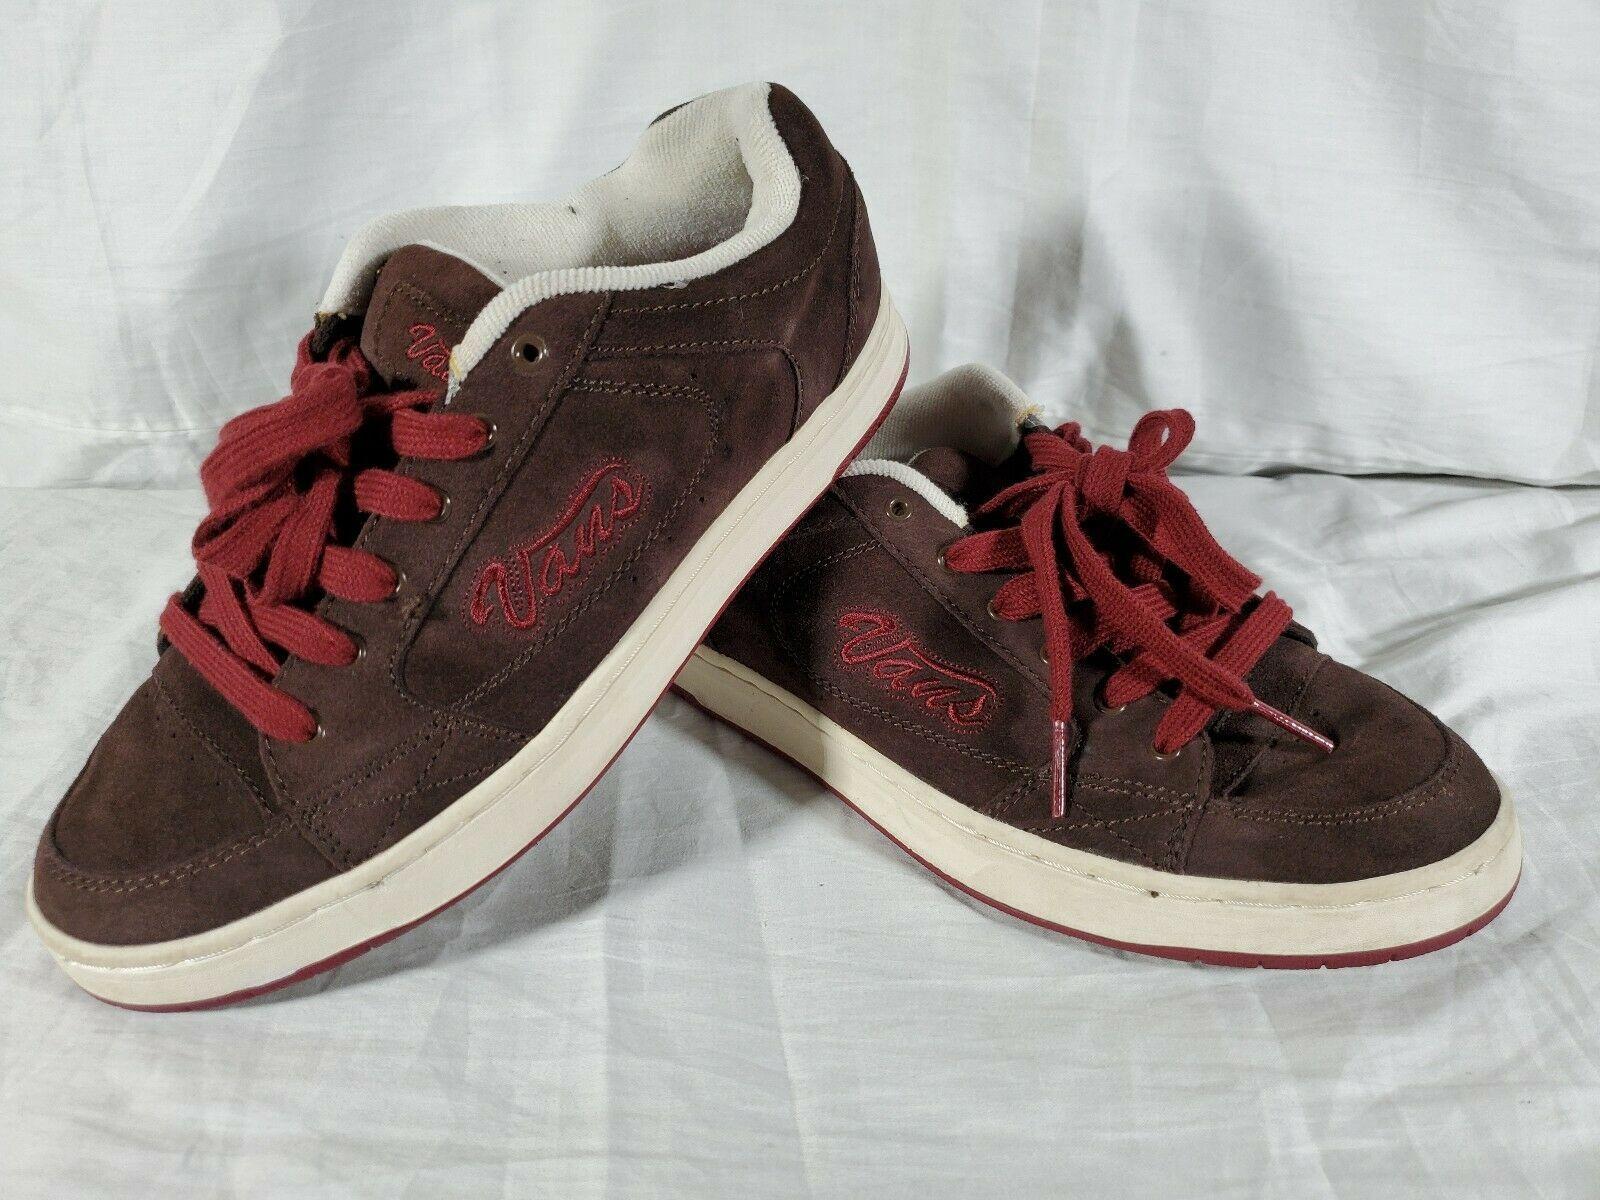 Vintage Vans Gwynn Brown Red Gwynn Skateboard Shoes Womens Size 10 55540 73 Ebay In 2020 Vintage Vans Vans Shoes For Sale Women Shoes